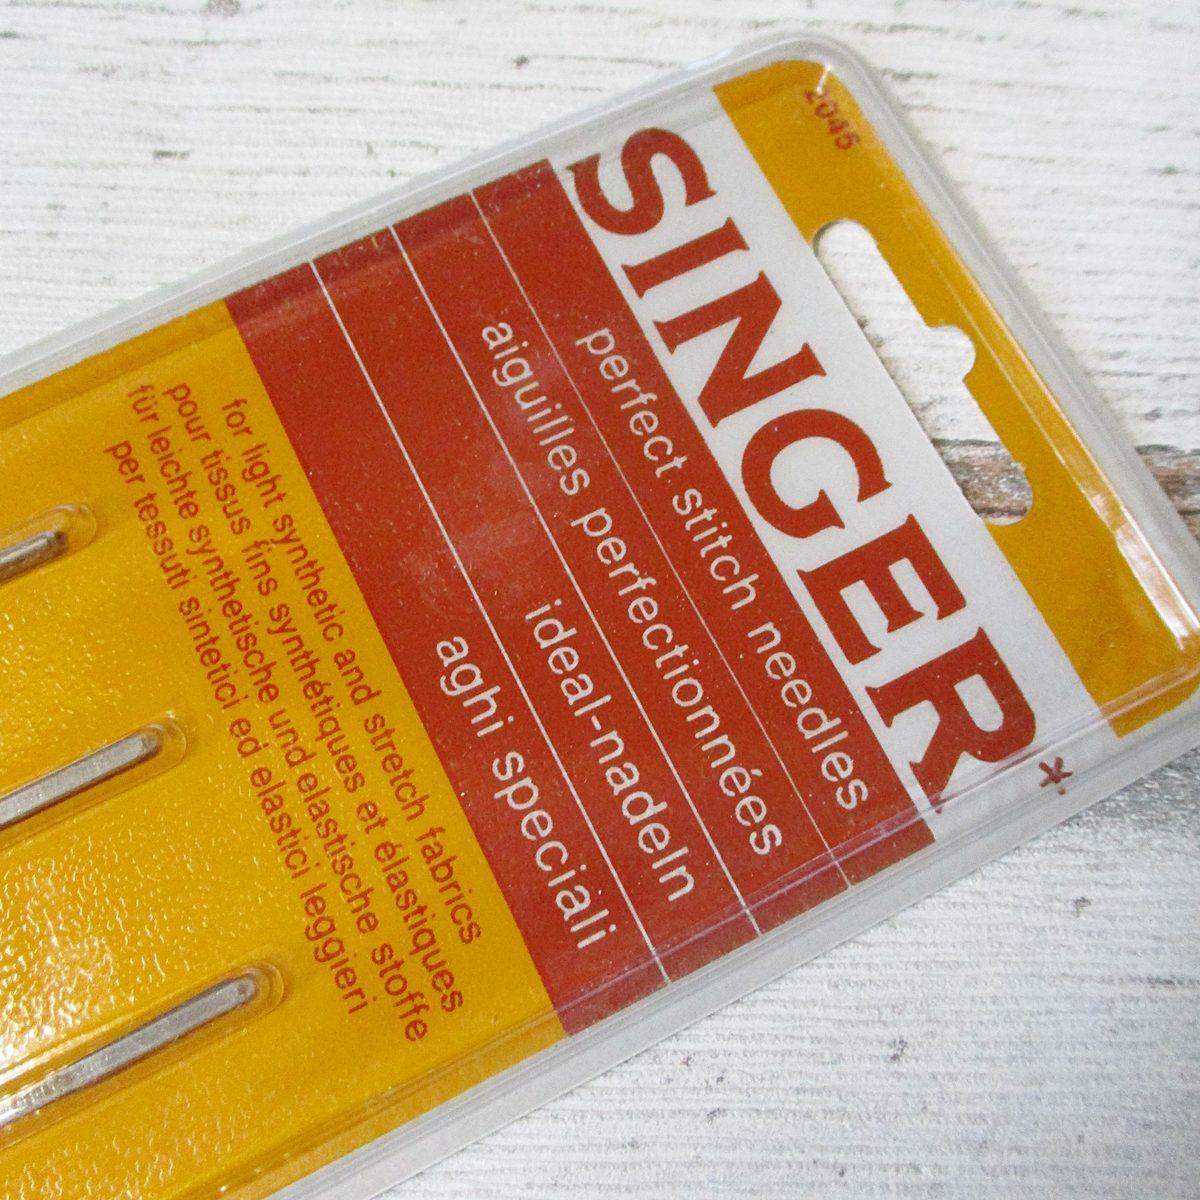 Nähmaschinennadeln Singer Stärke 80 Synthetik Stretch - Woolnerd